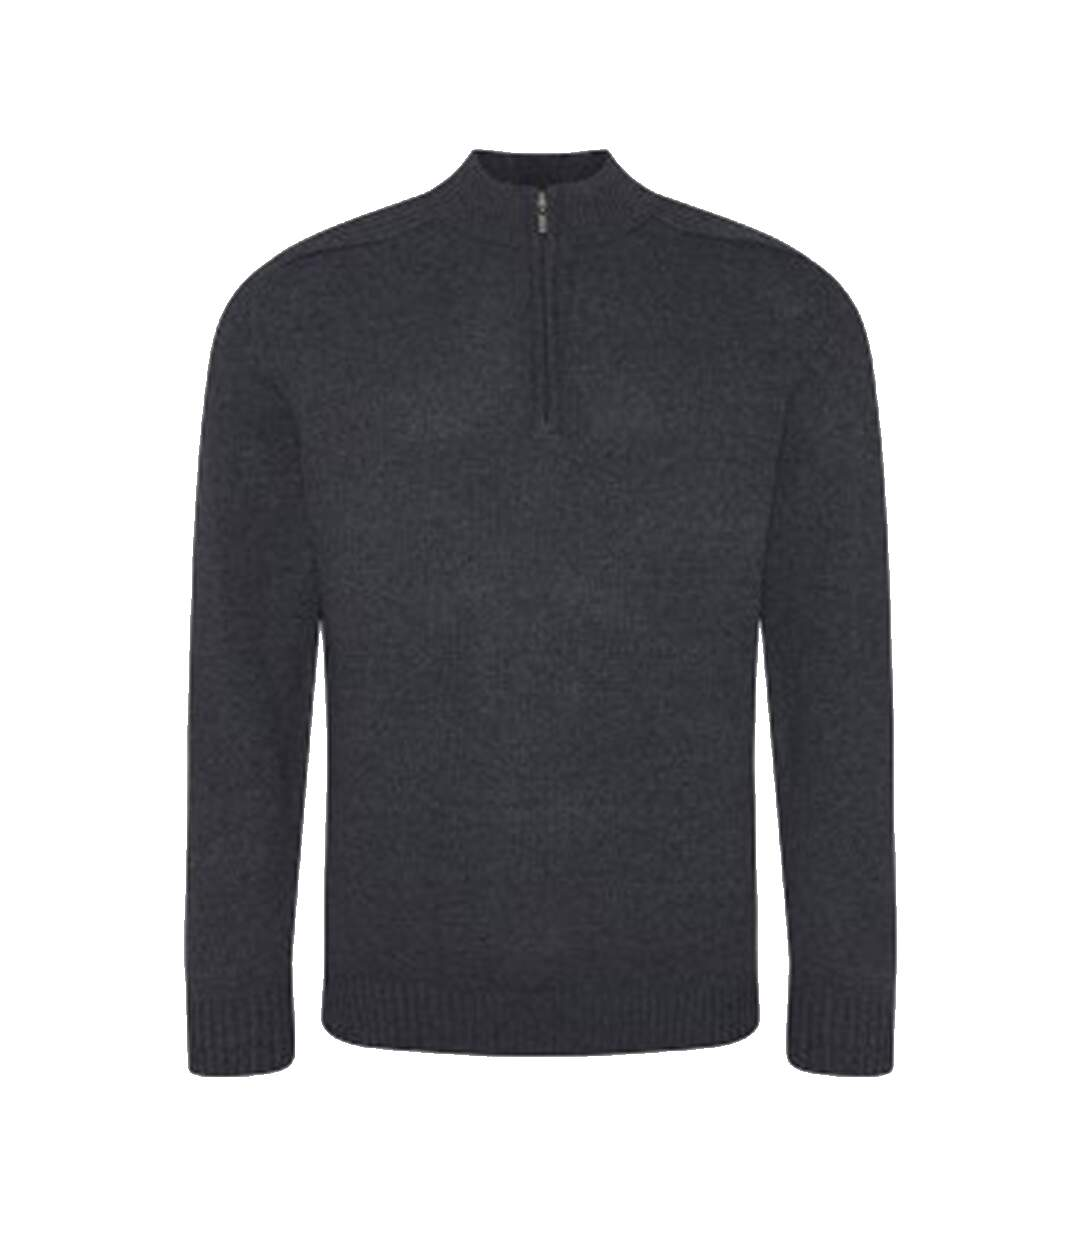 Ecologie Mens Wakhan Zip Neck Sweater (Charcoal) - UTPC3065